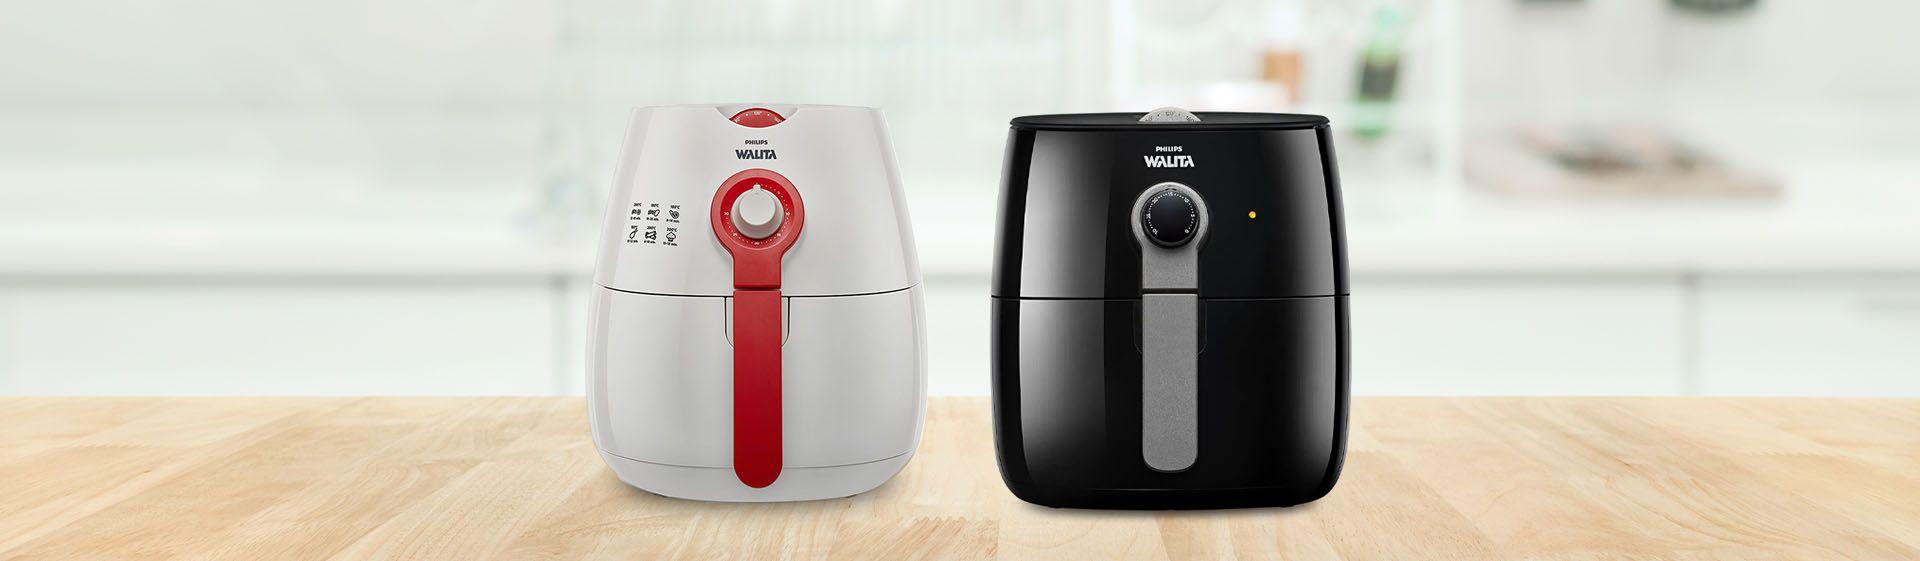 Airfryer Philips Walita Viva vs Turbofryer: confira o comparativo entre os dois modelos de fritadeira elétrica